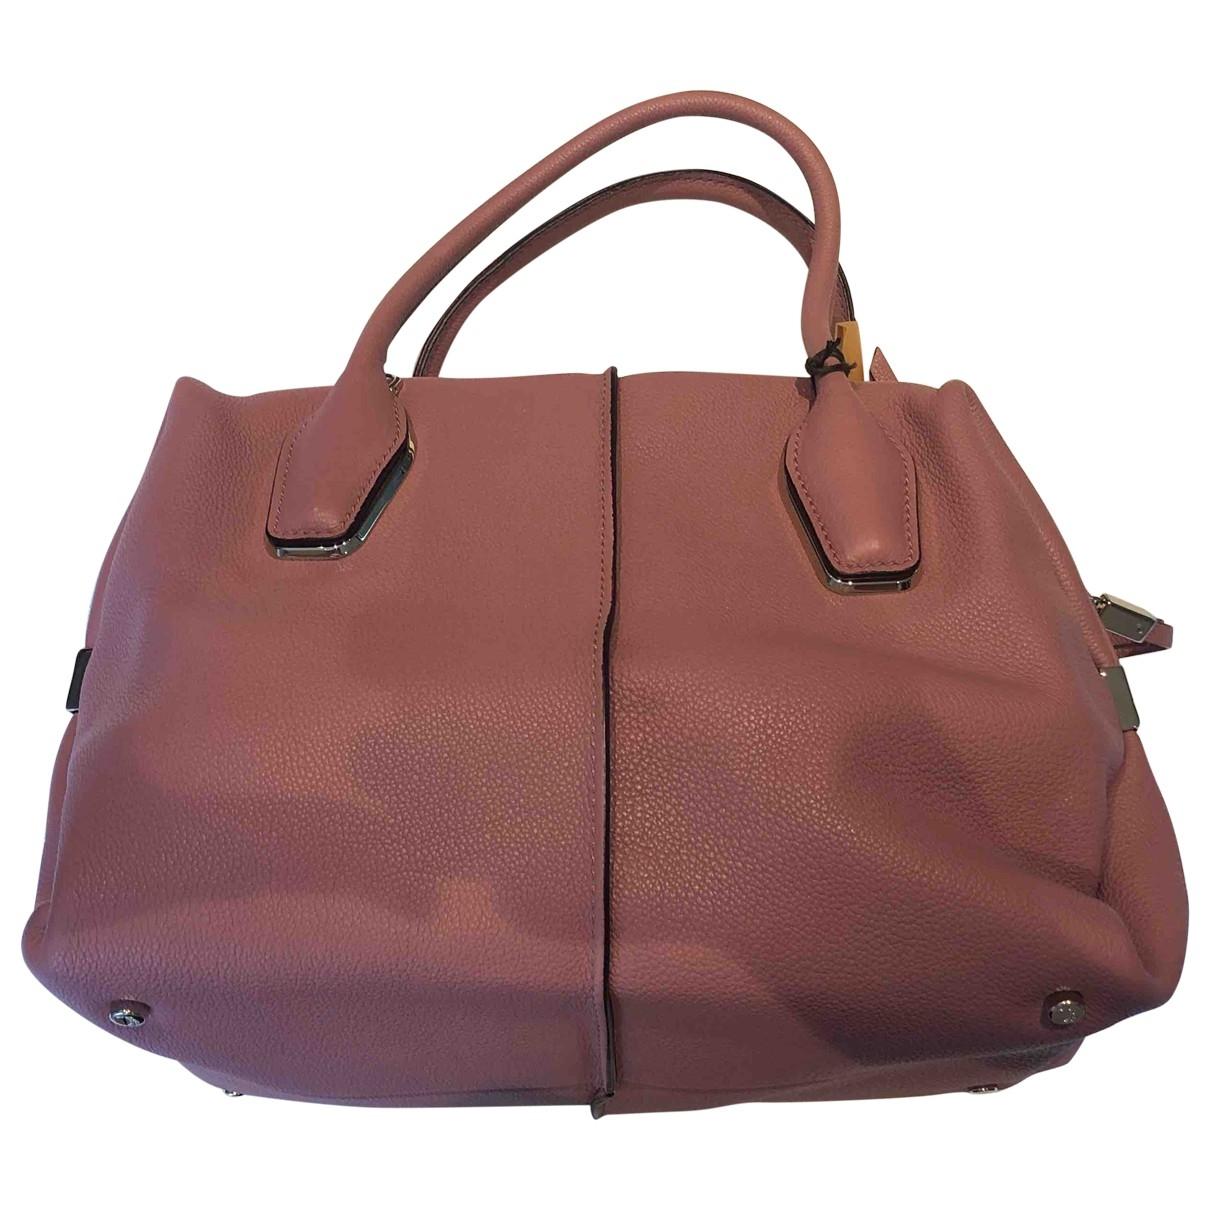 Tods \N Pink Leather handbag for Women \N